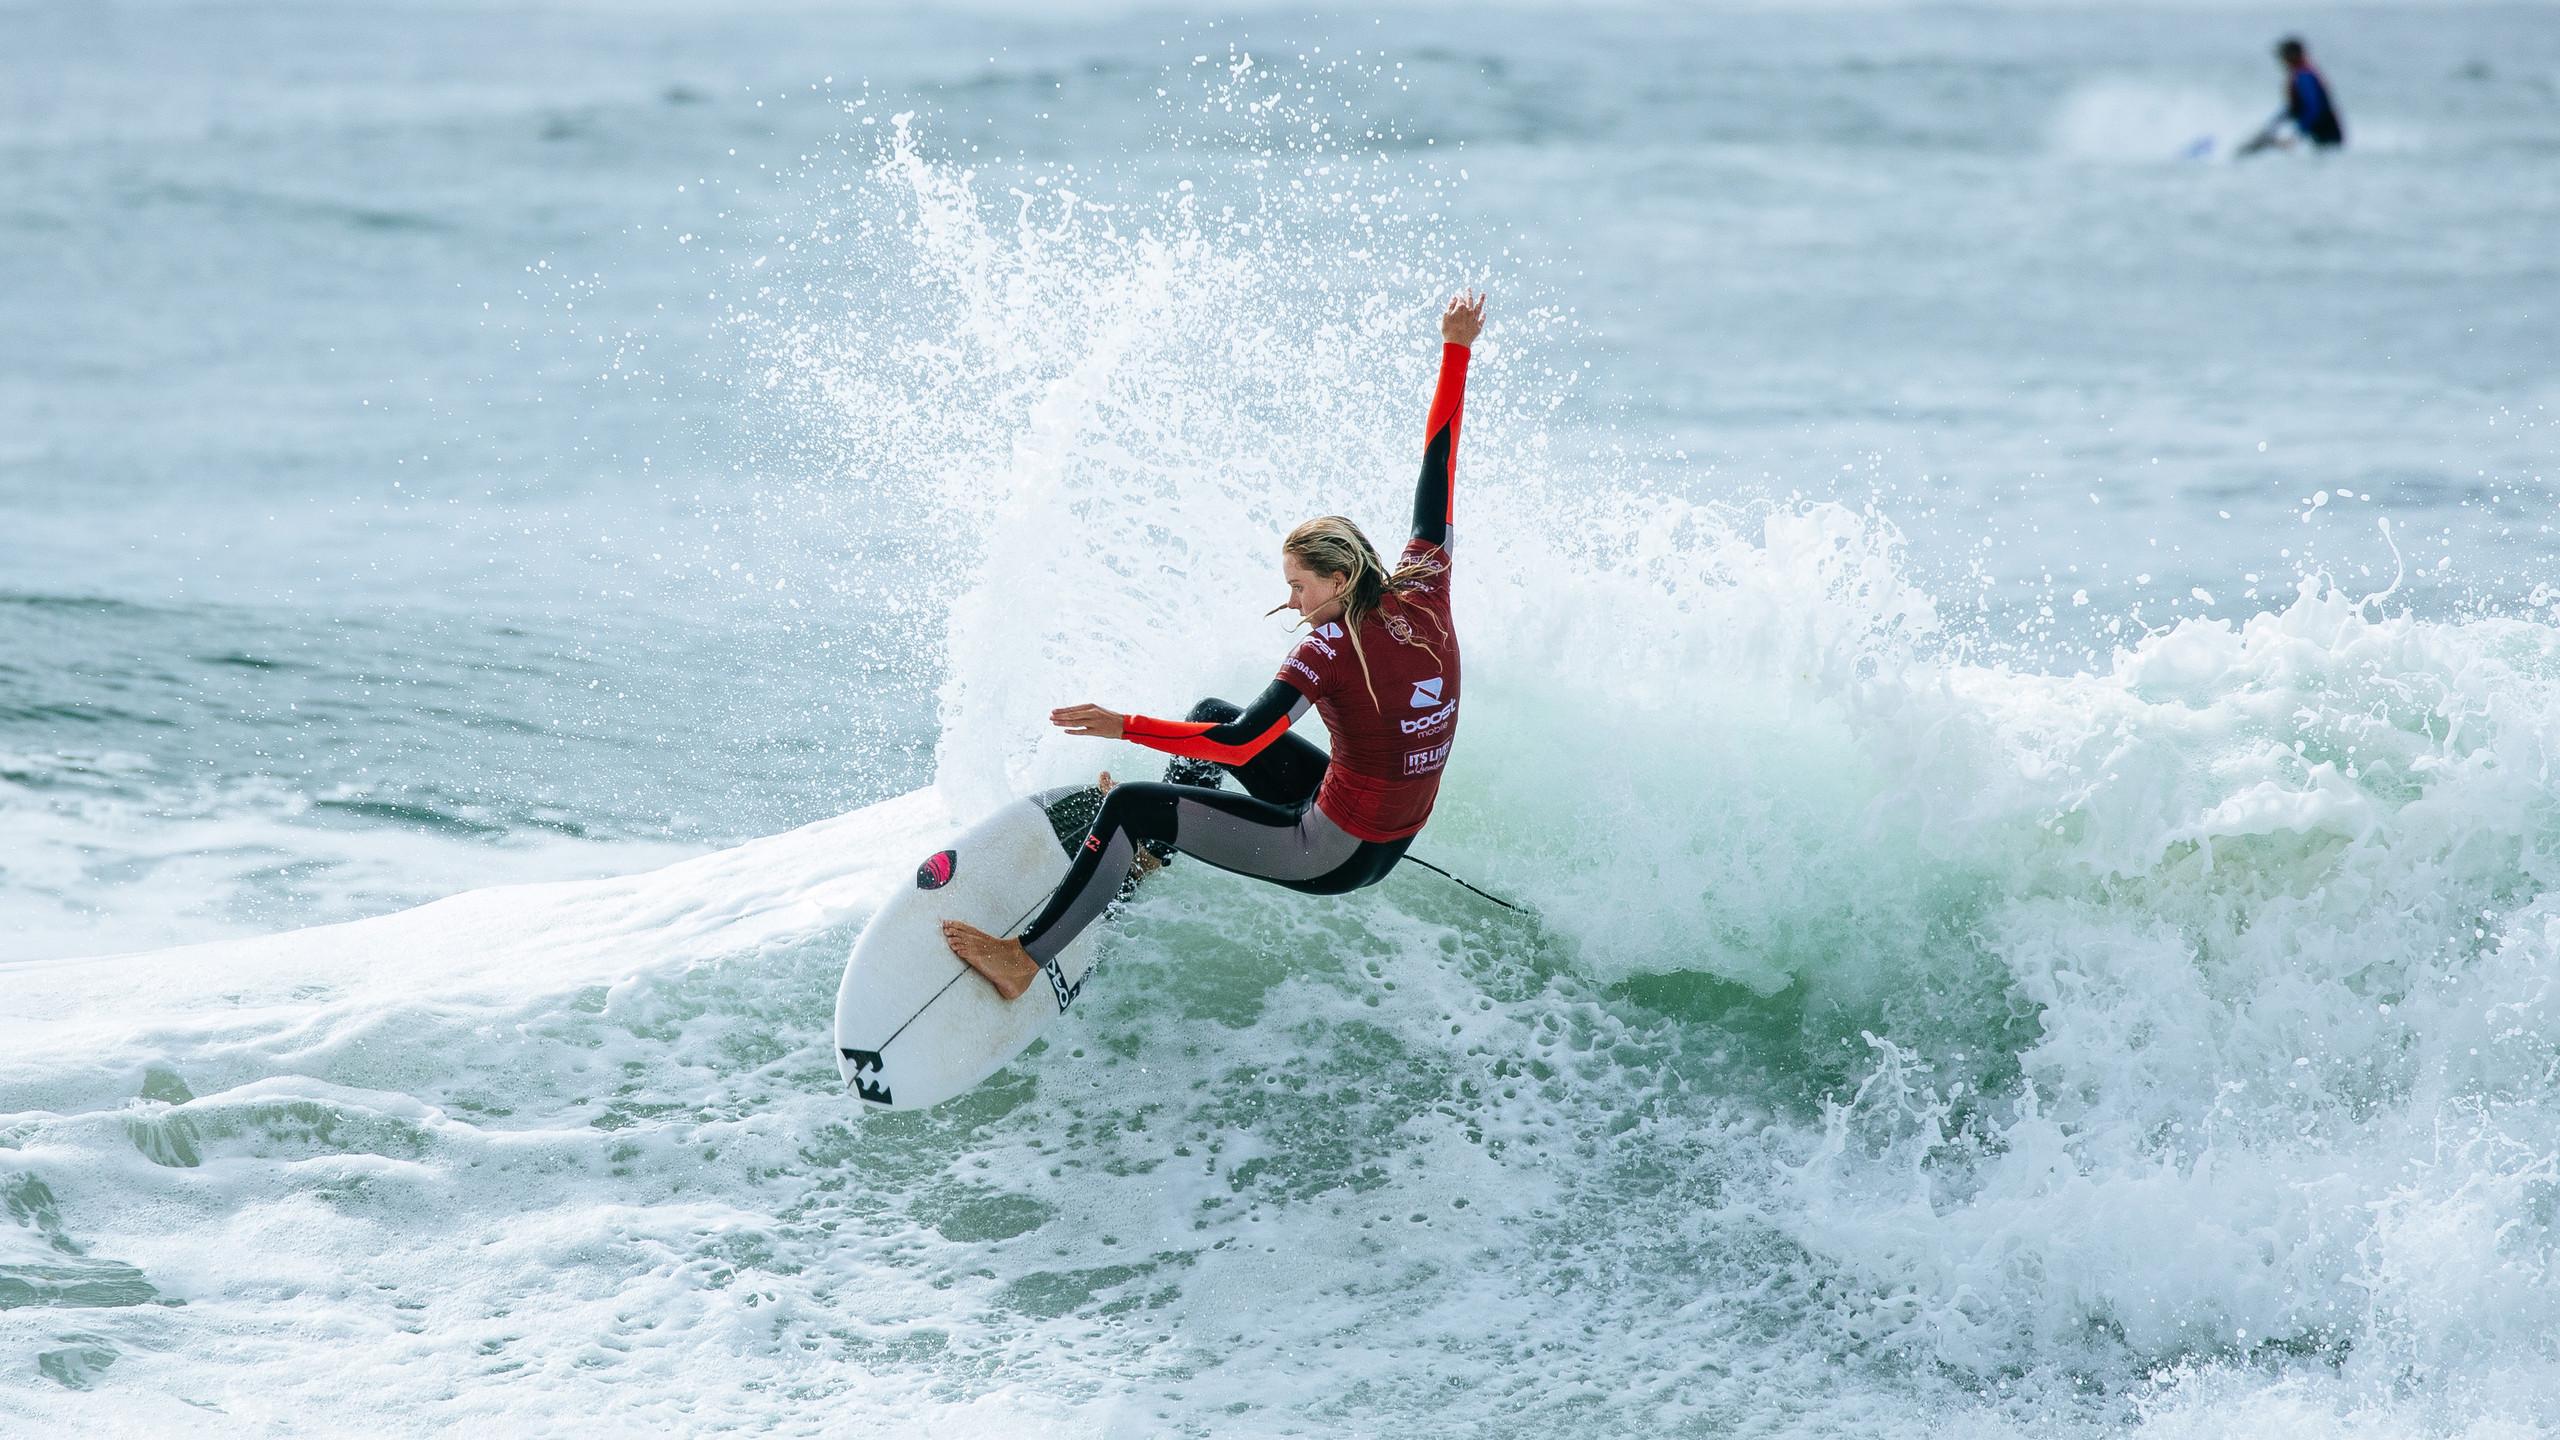 A surfista Macy Callaghan, um dos destaques do Boost Mobile Pro Gold Coast.